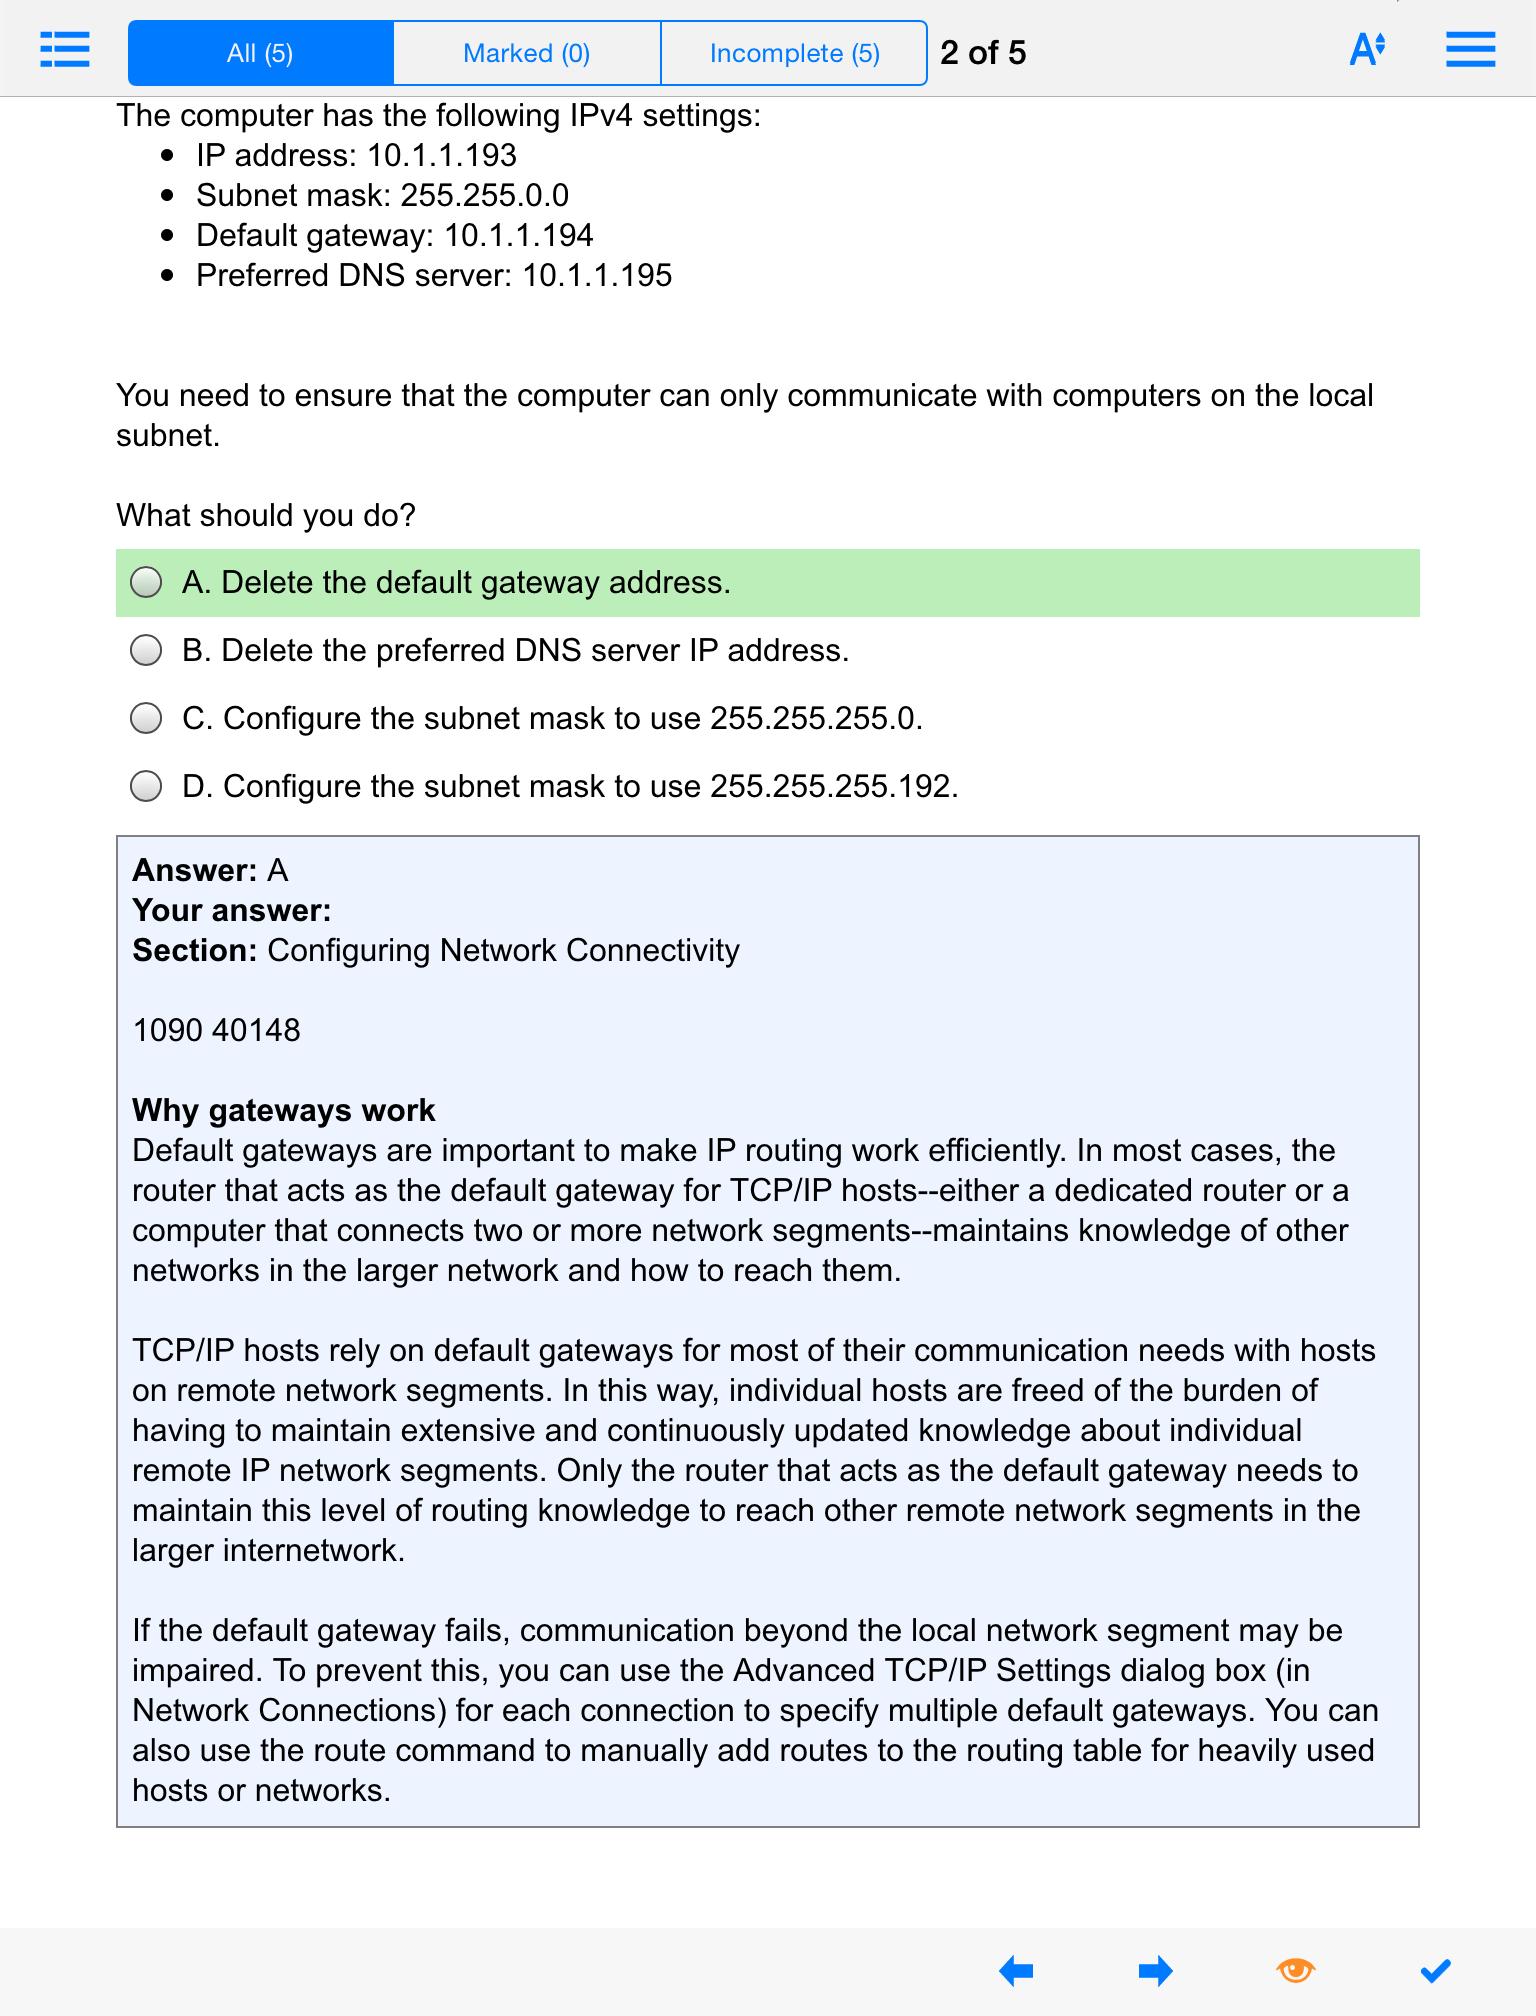 download visual certexam suite 3.4 2 cracked version